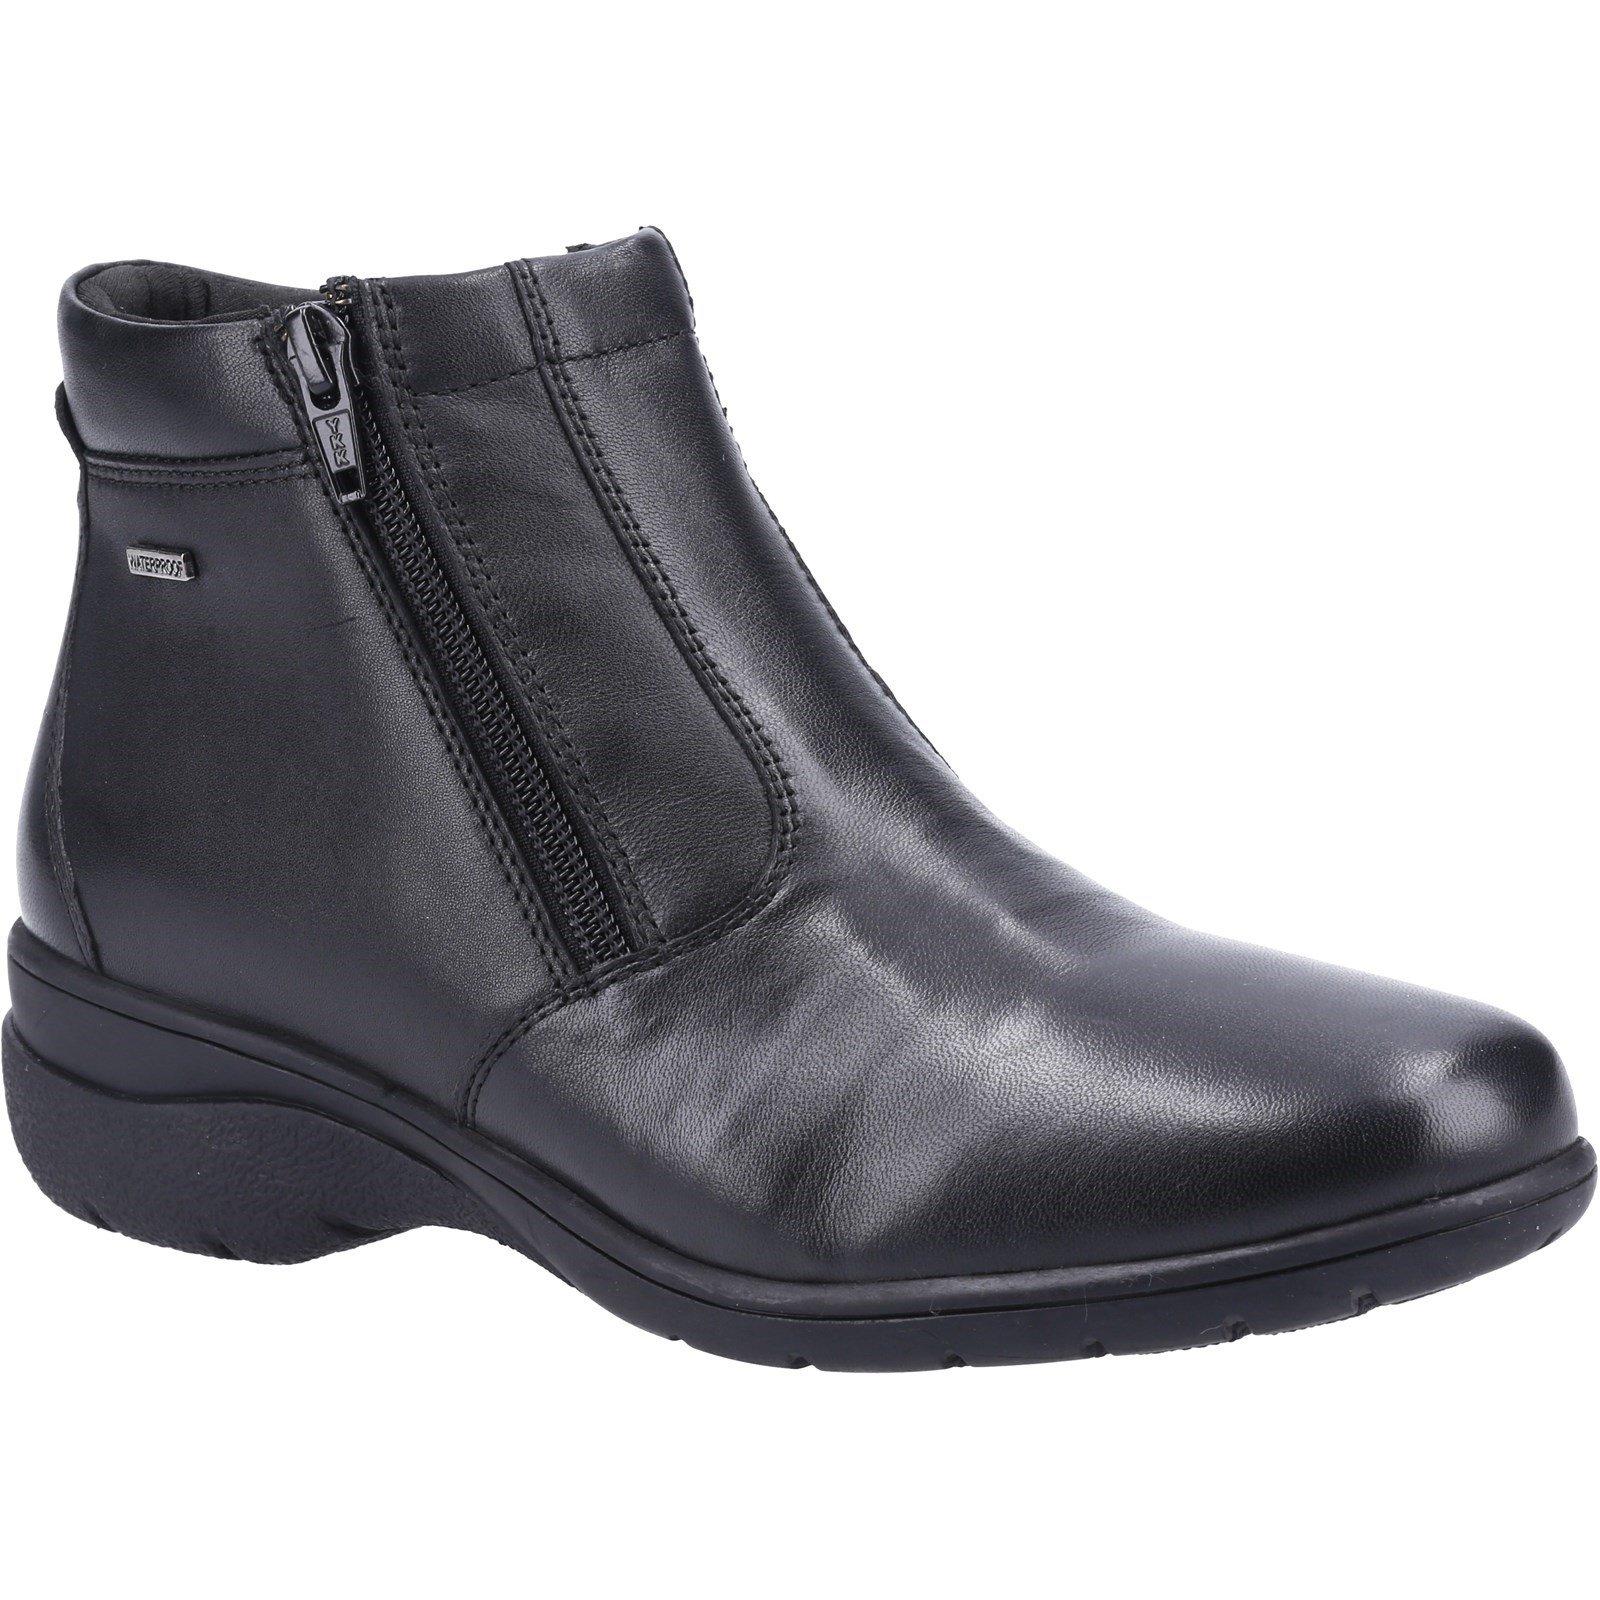 Cotswold Women's Deerhurst Waterproof Boot Black - Black 3